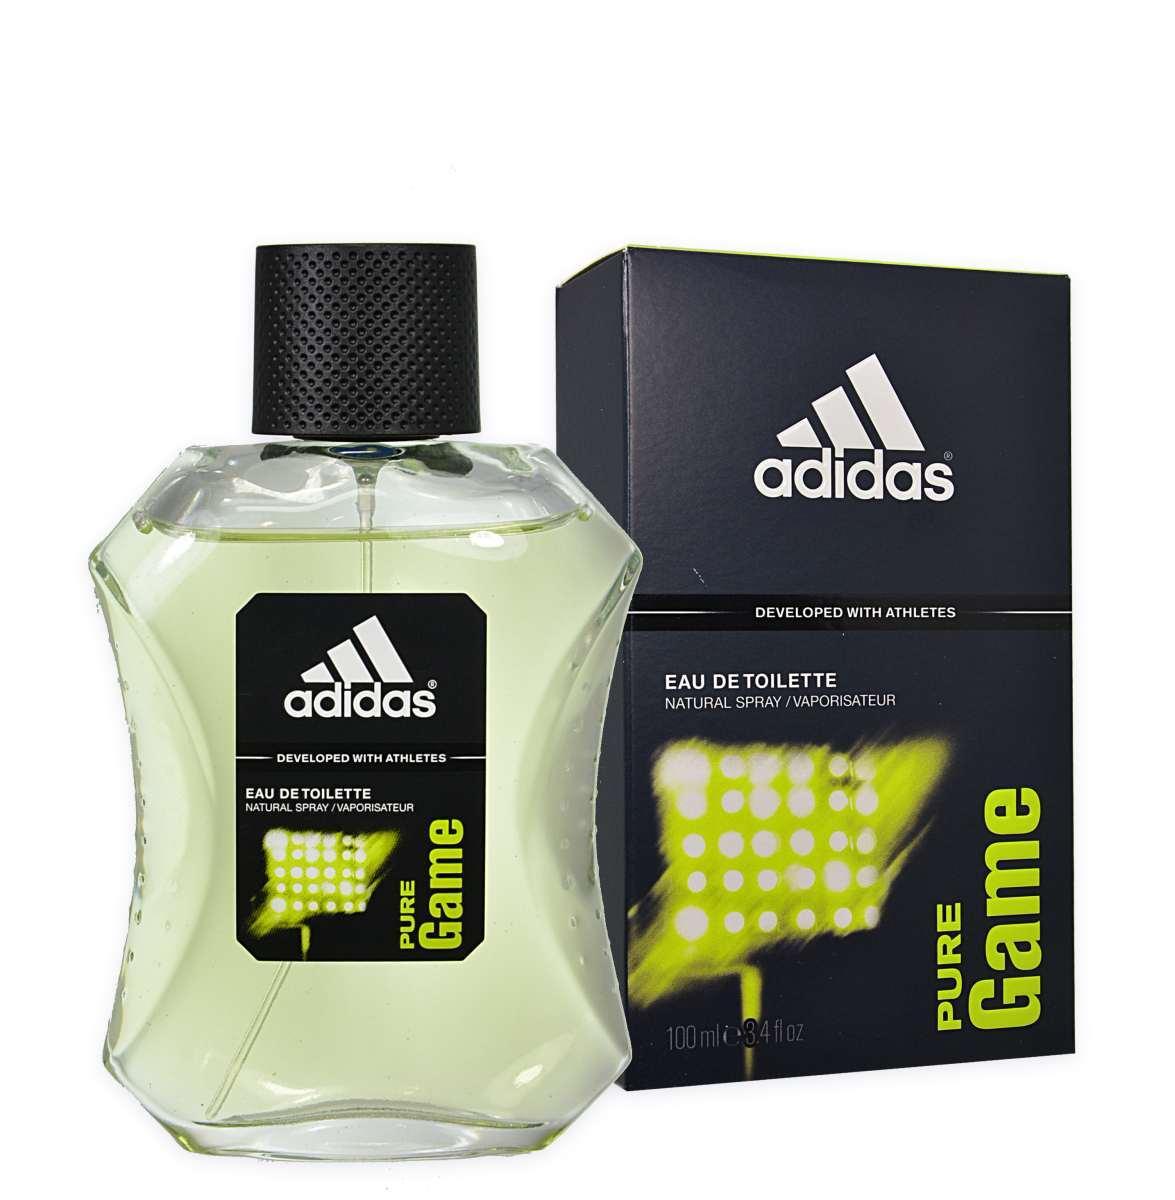 Adidas Adidas pure game edt 100ml vp ADI215150 3607345216805 574c95fcb3